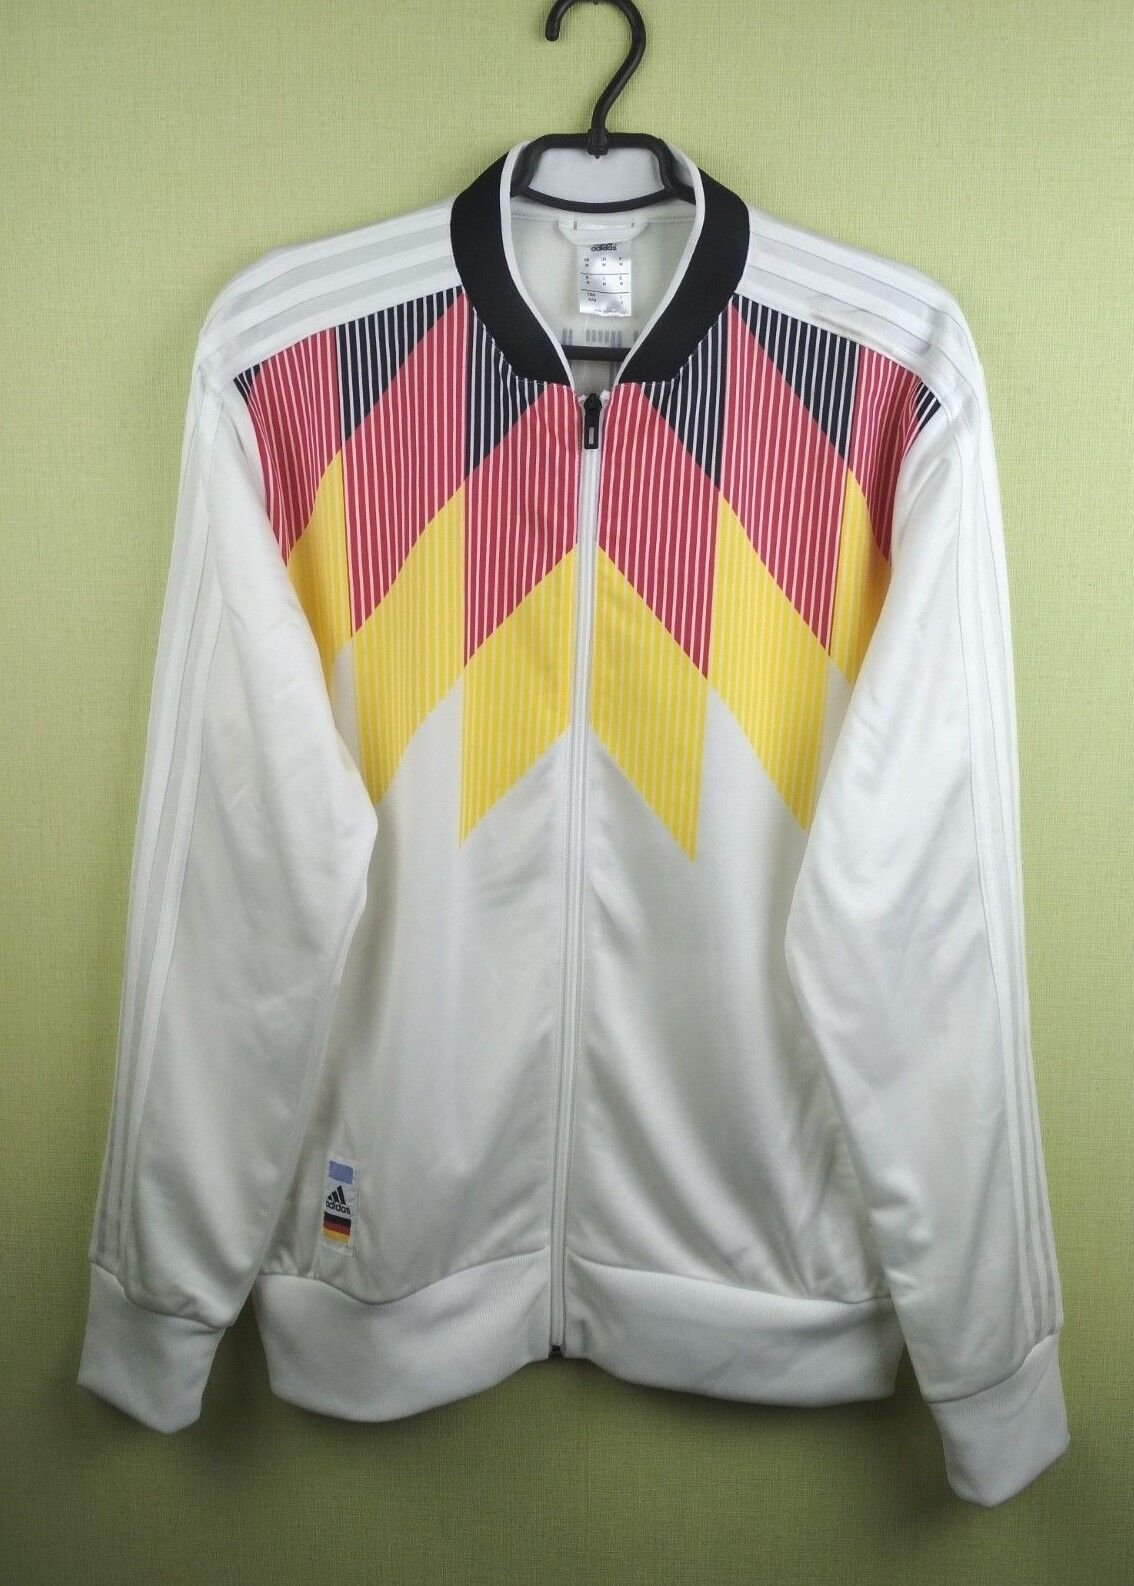 Geruomoy DFB vintage retro jacket replica MEDIUM CF1735 socer footbtutti Adidas